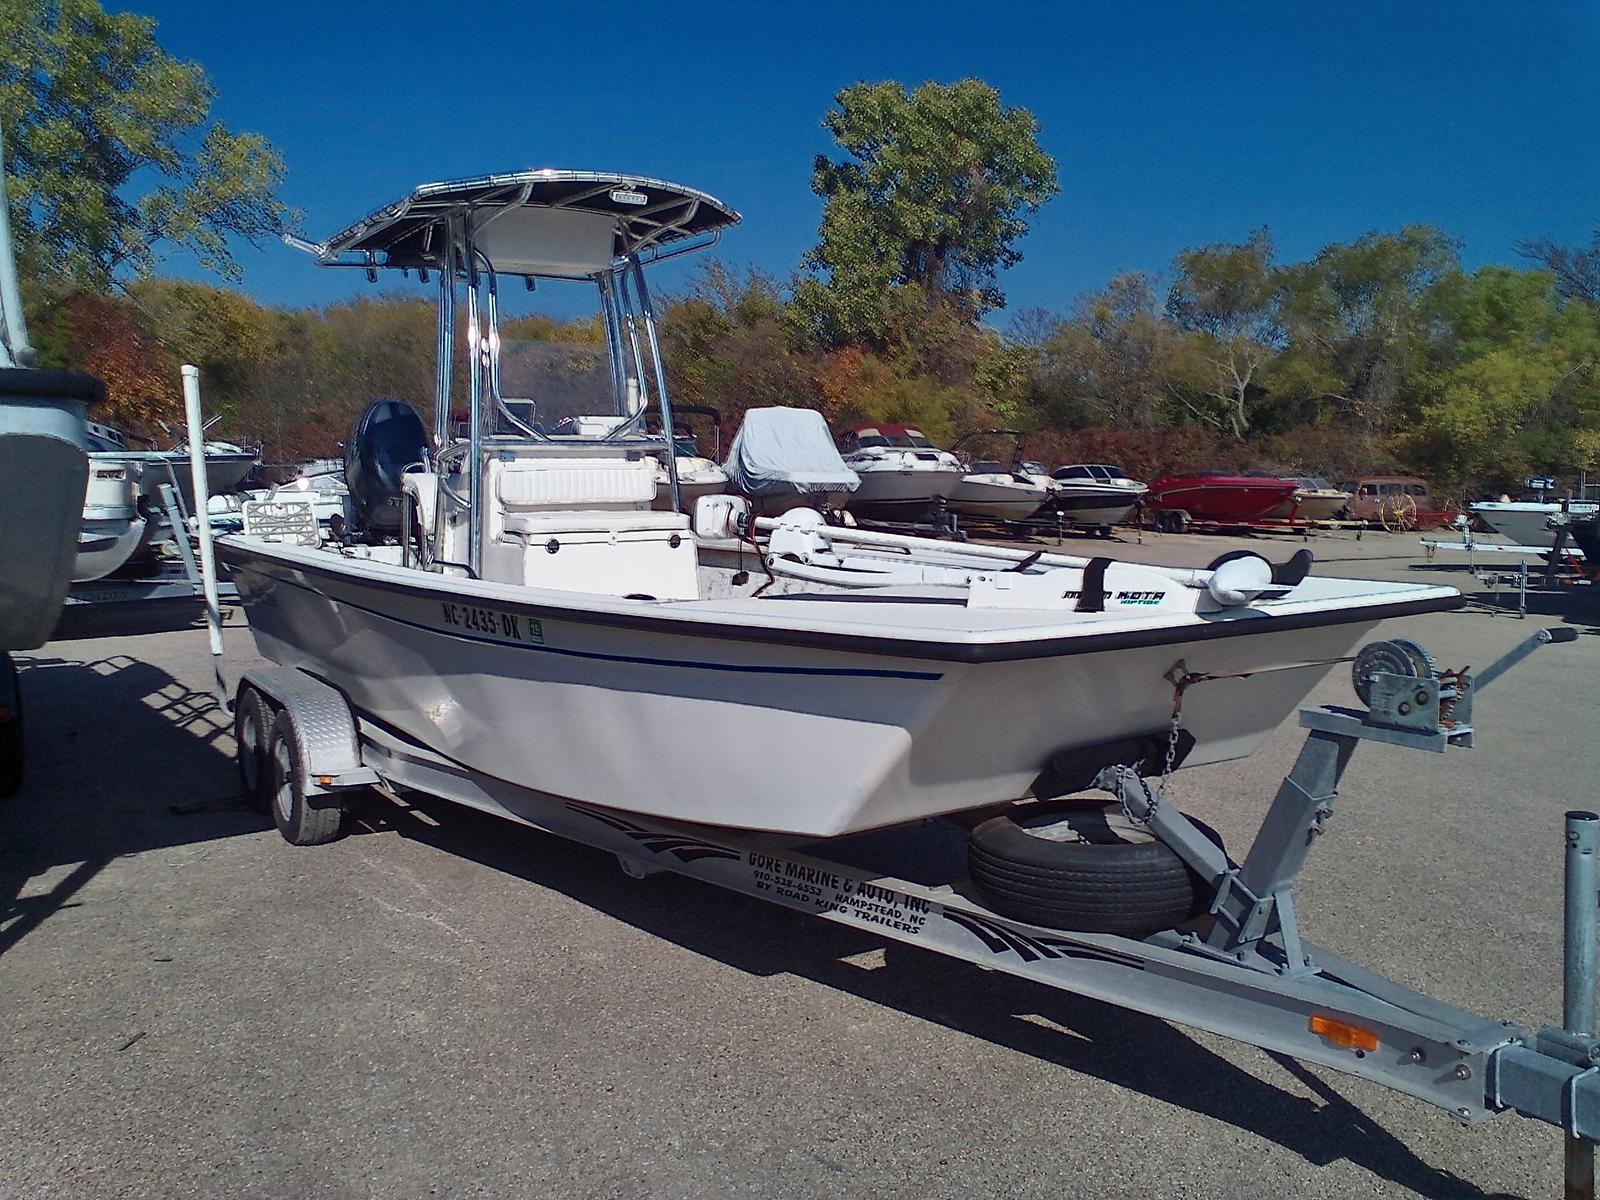 2008 Riddick boat for sale, model of the boat is Bay Runner 2290 & Image # 3 of 6